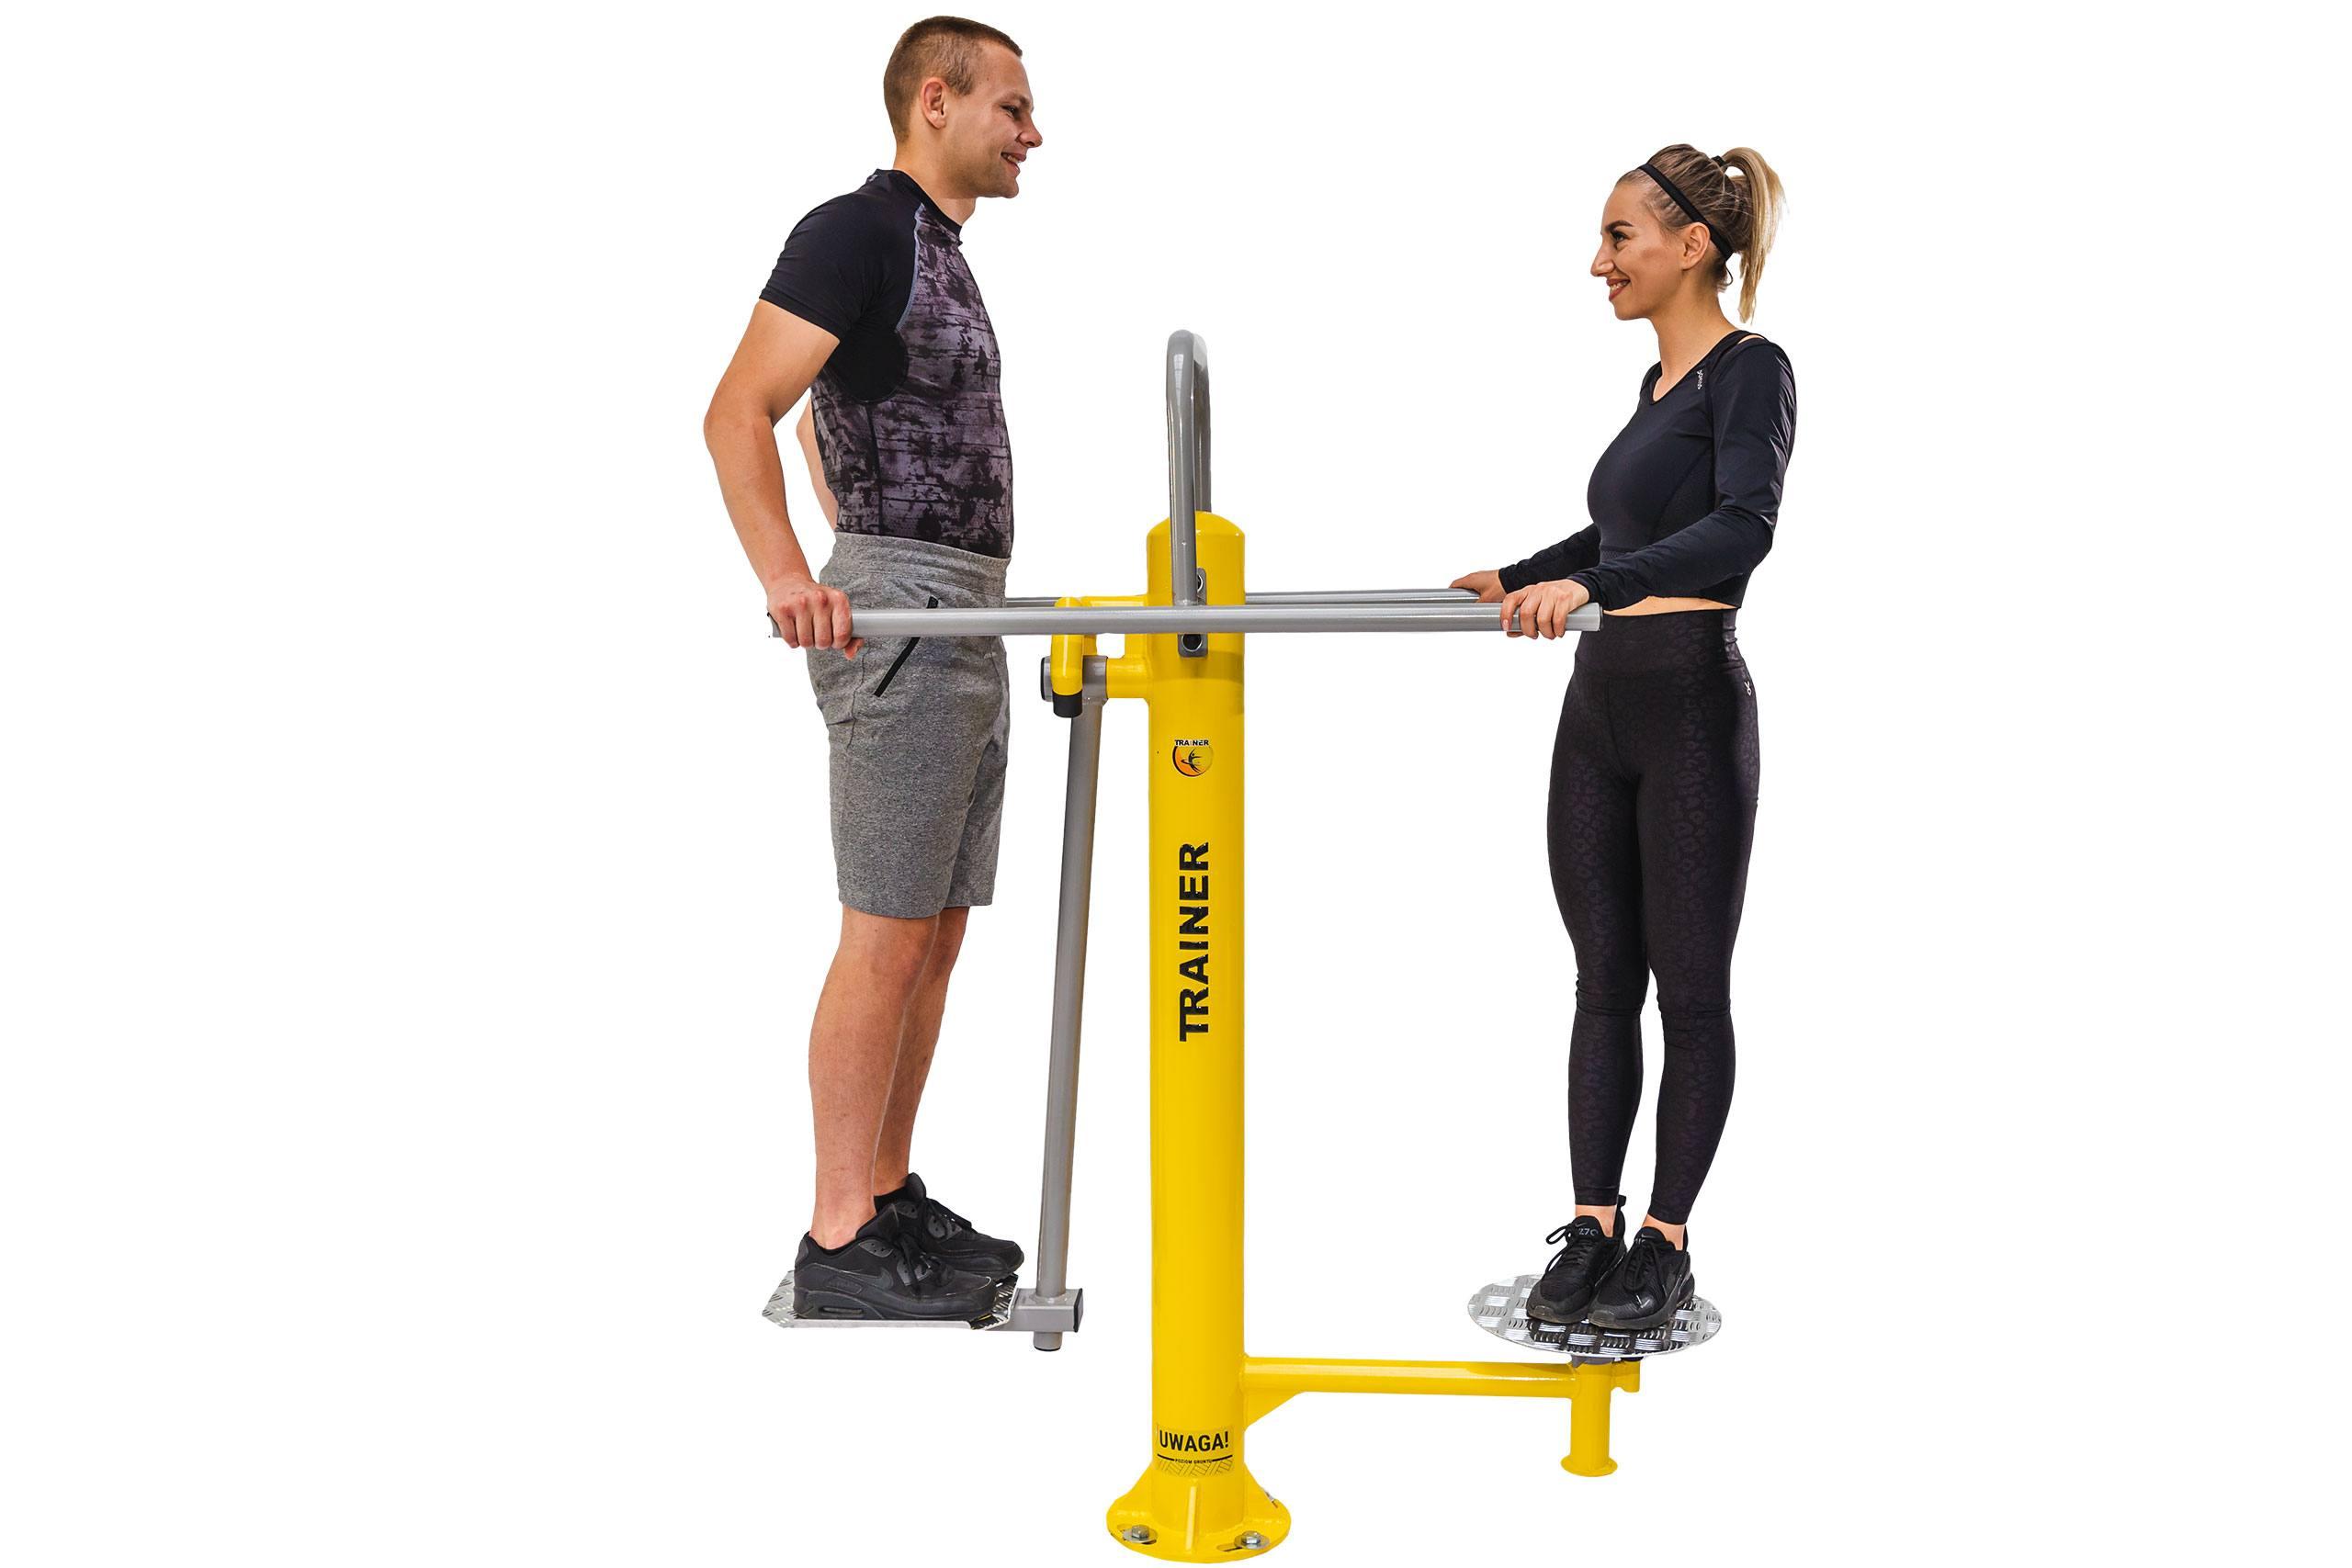 Twister & Surfer Outdoor Fitness Equipment